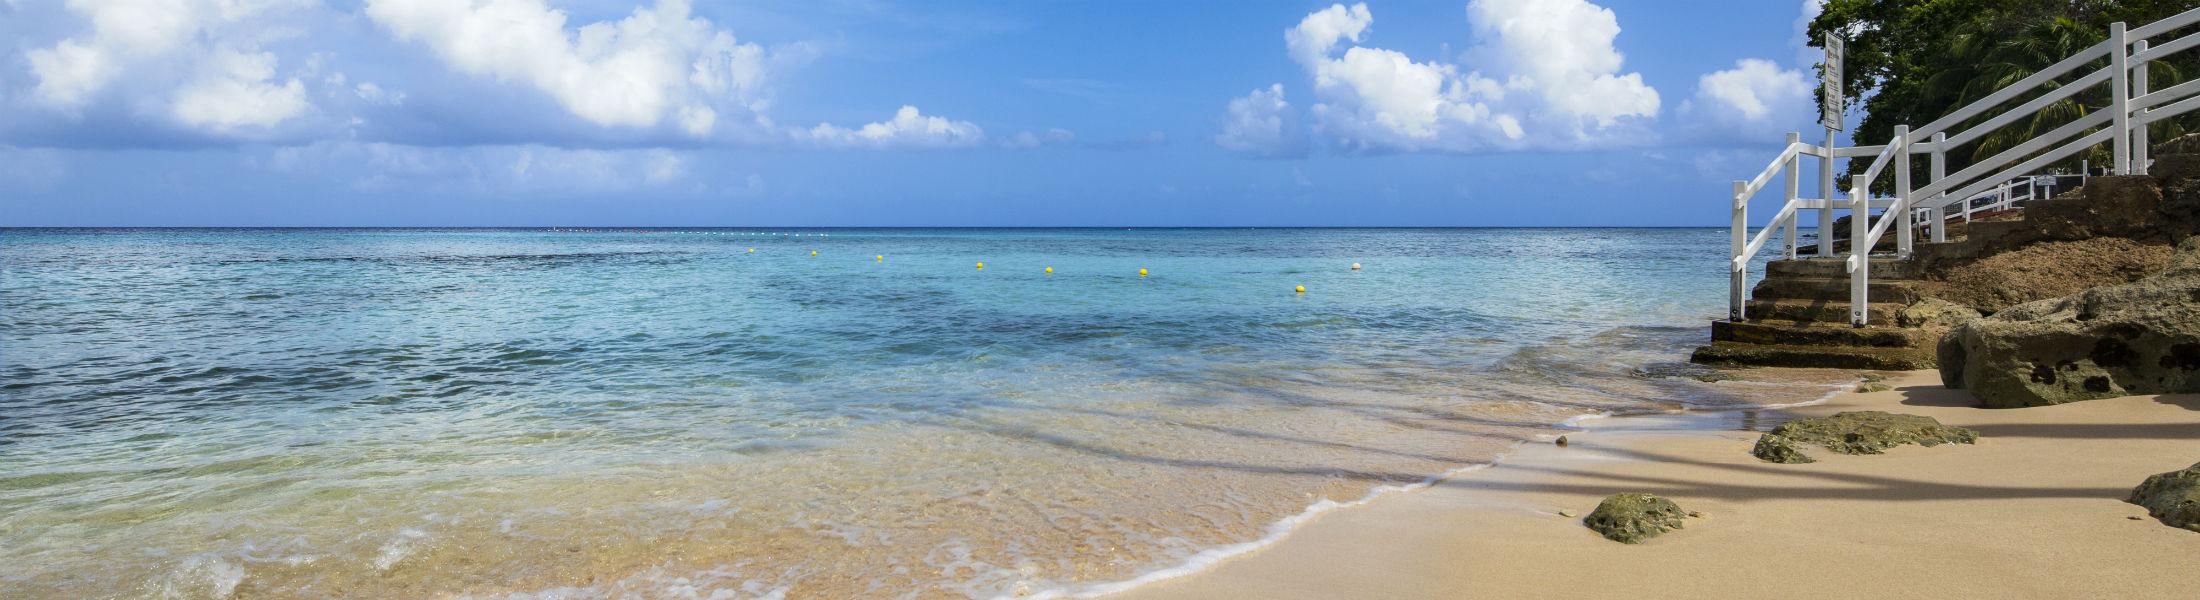 Sandy beach at The Club Barbados Resort & Spa, Barbados